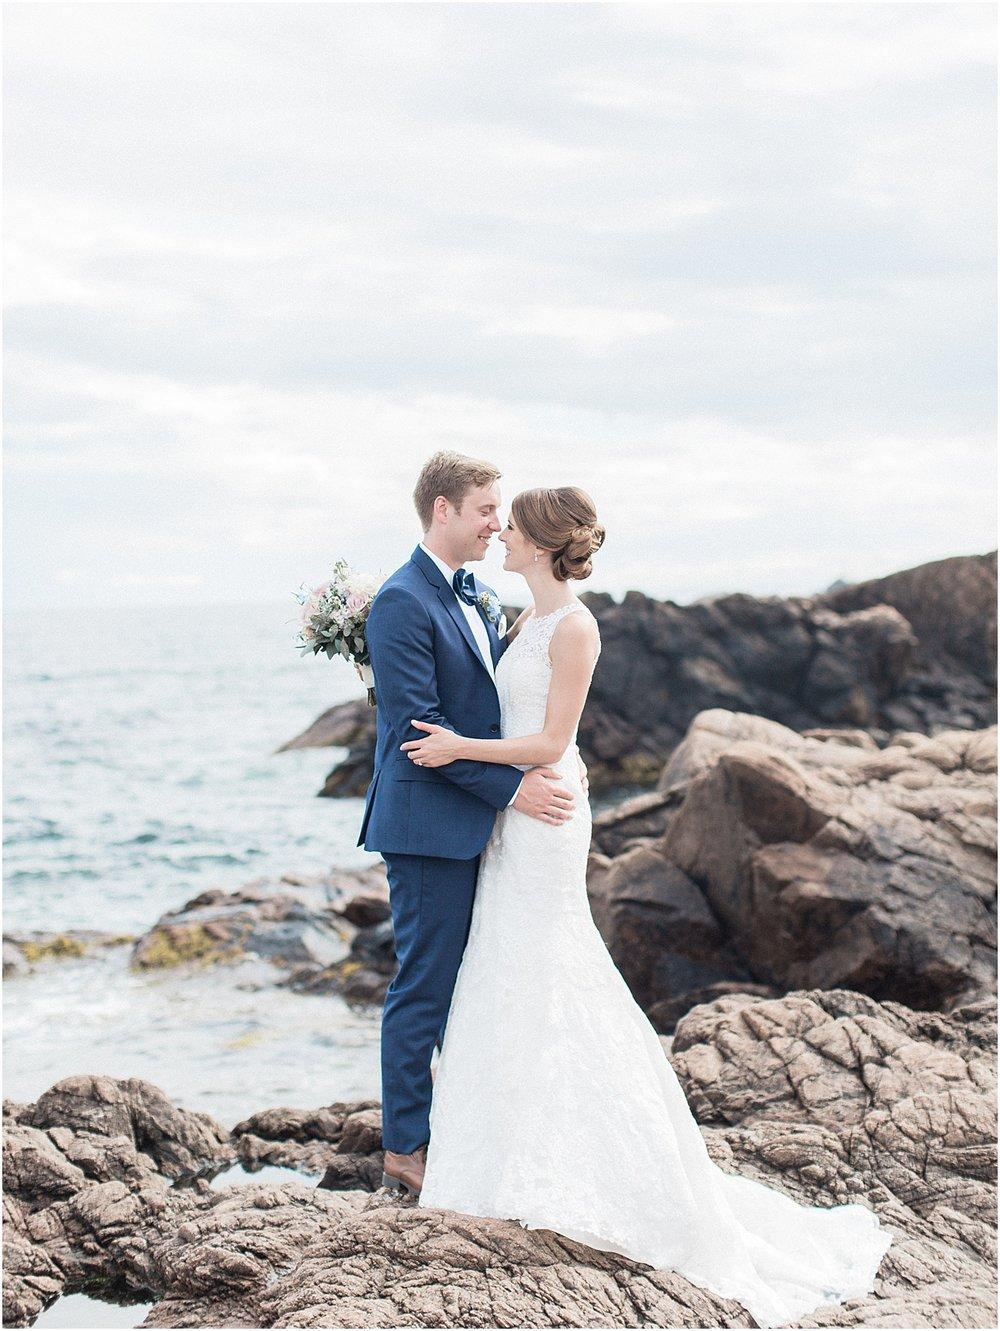 kelly_zach_cruisport_gloucester_ma_bass_rocks_cape_cod_boston_wedding_photographer_meredith_jane_photography_photo_0675.jpg